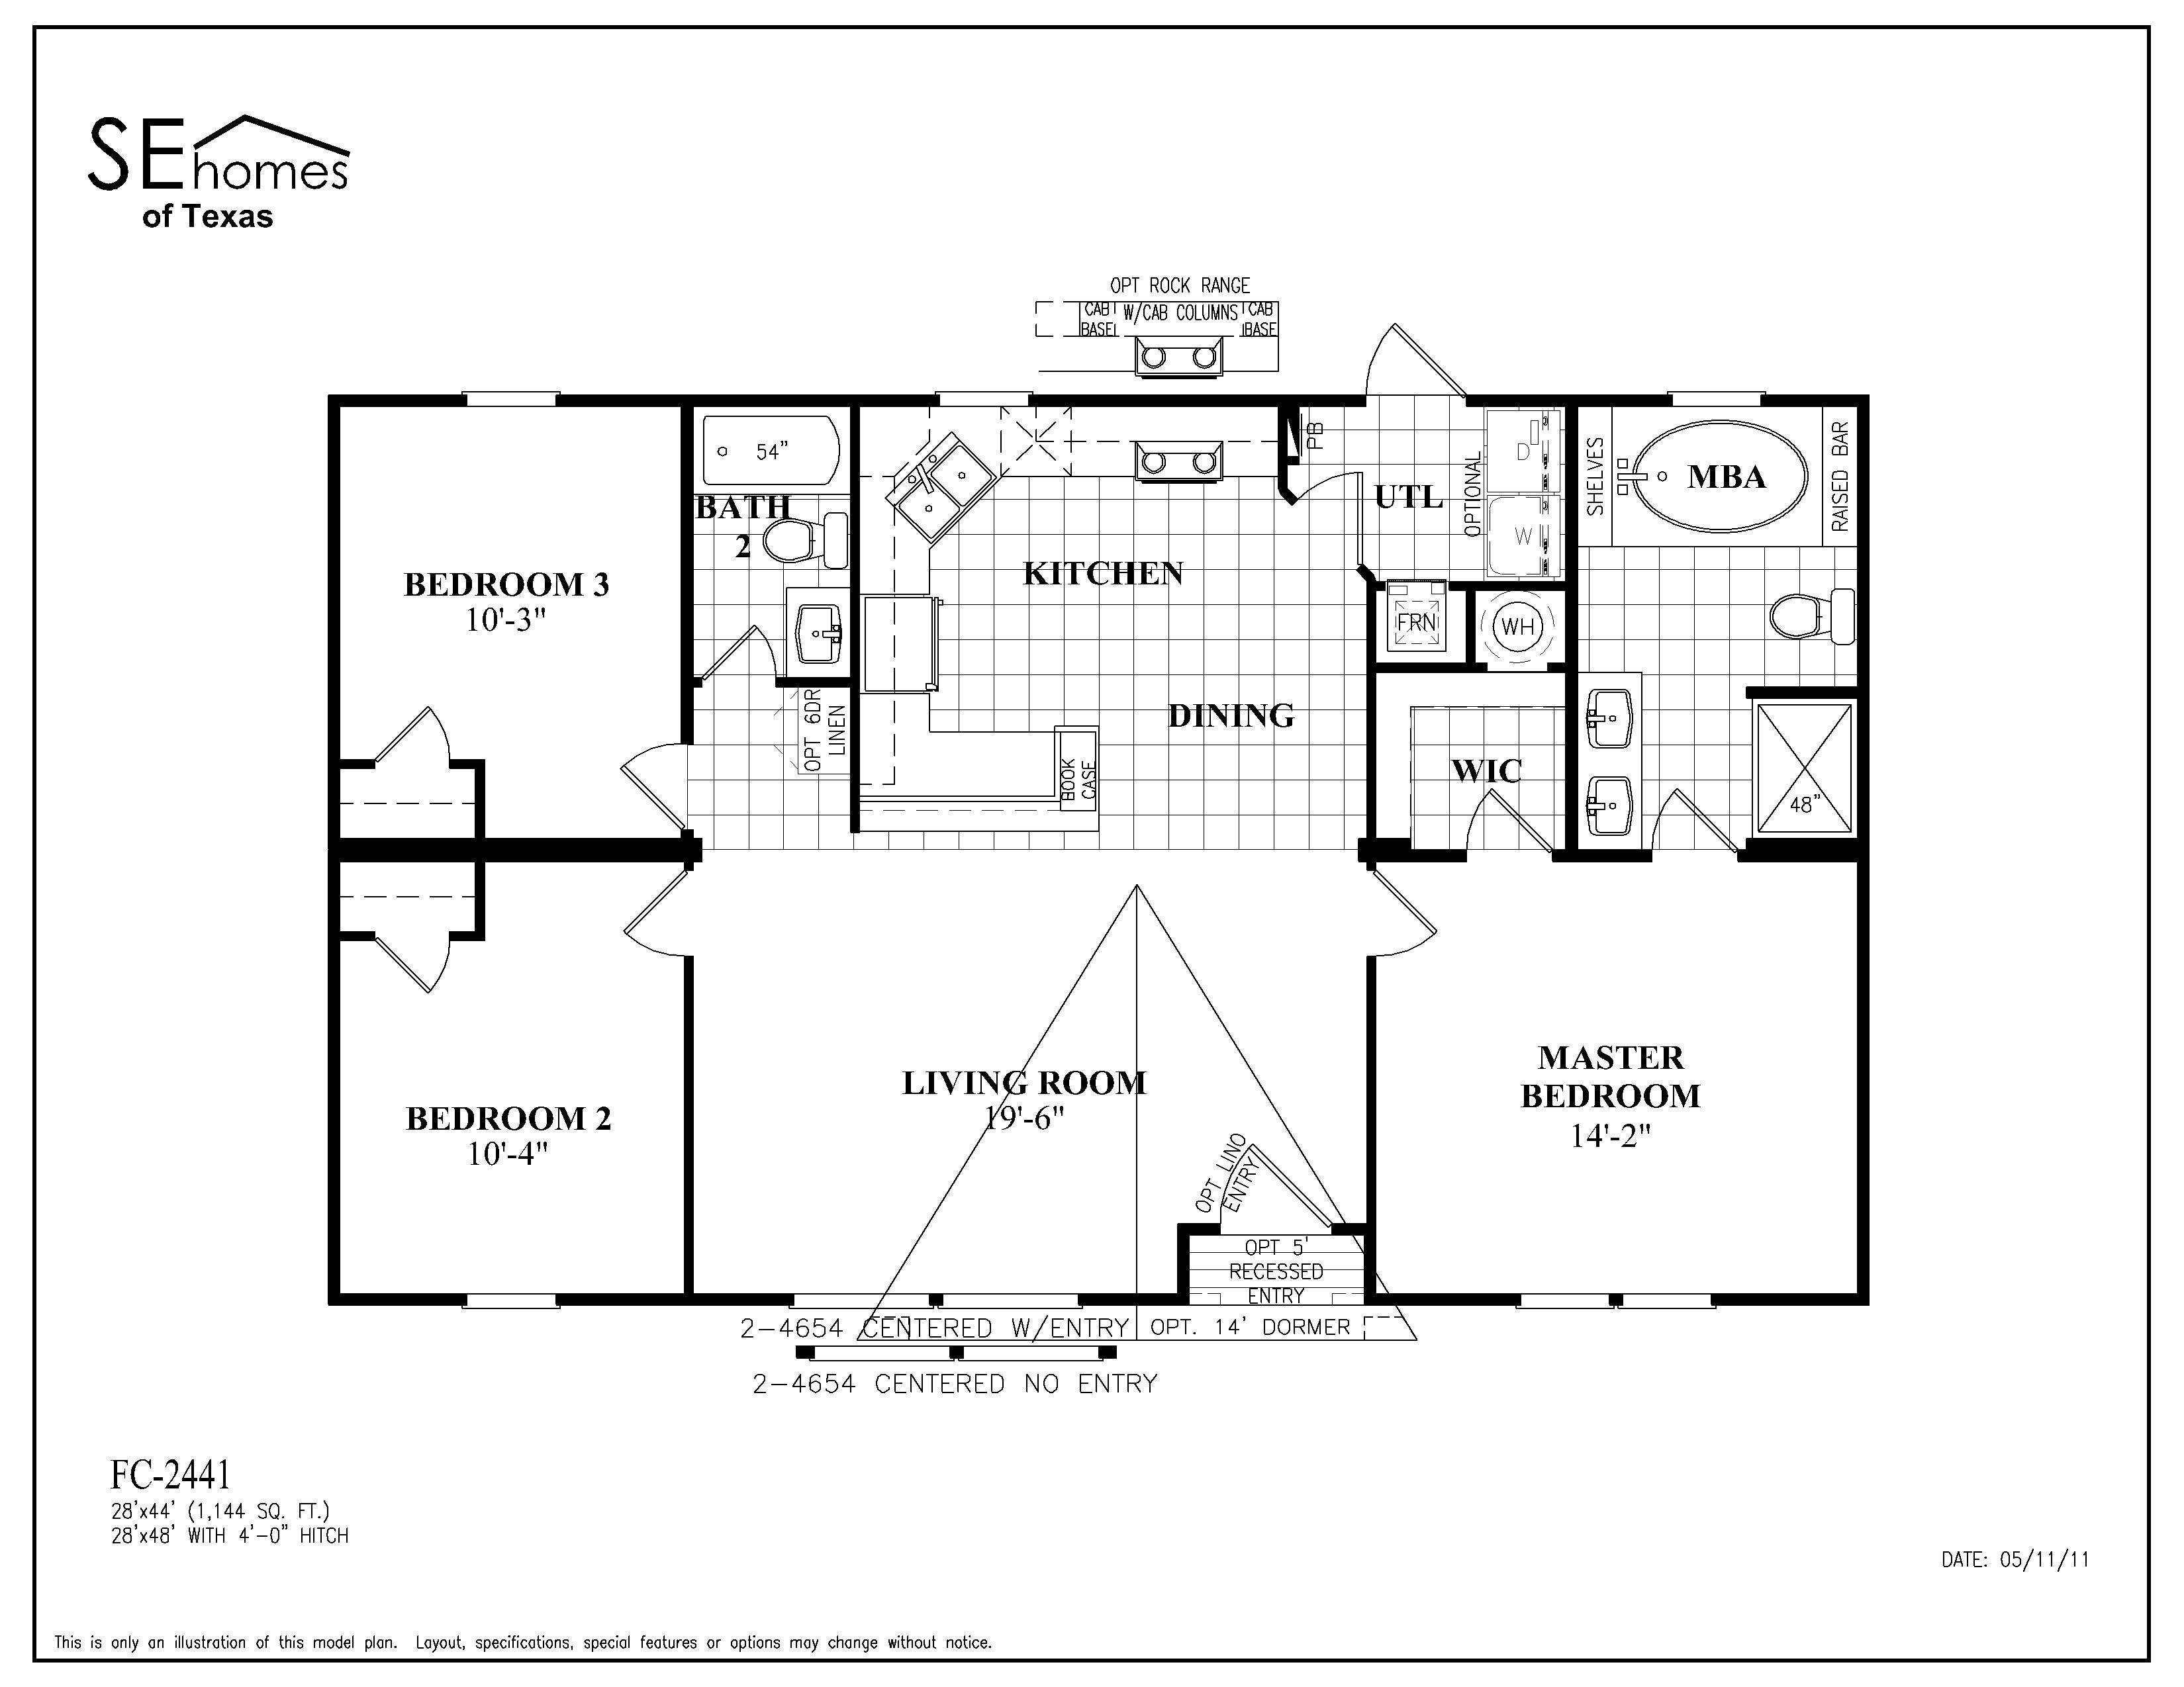 Sunshine Mobile Homes Floor Plans Home Plan